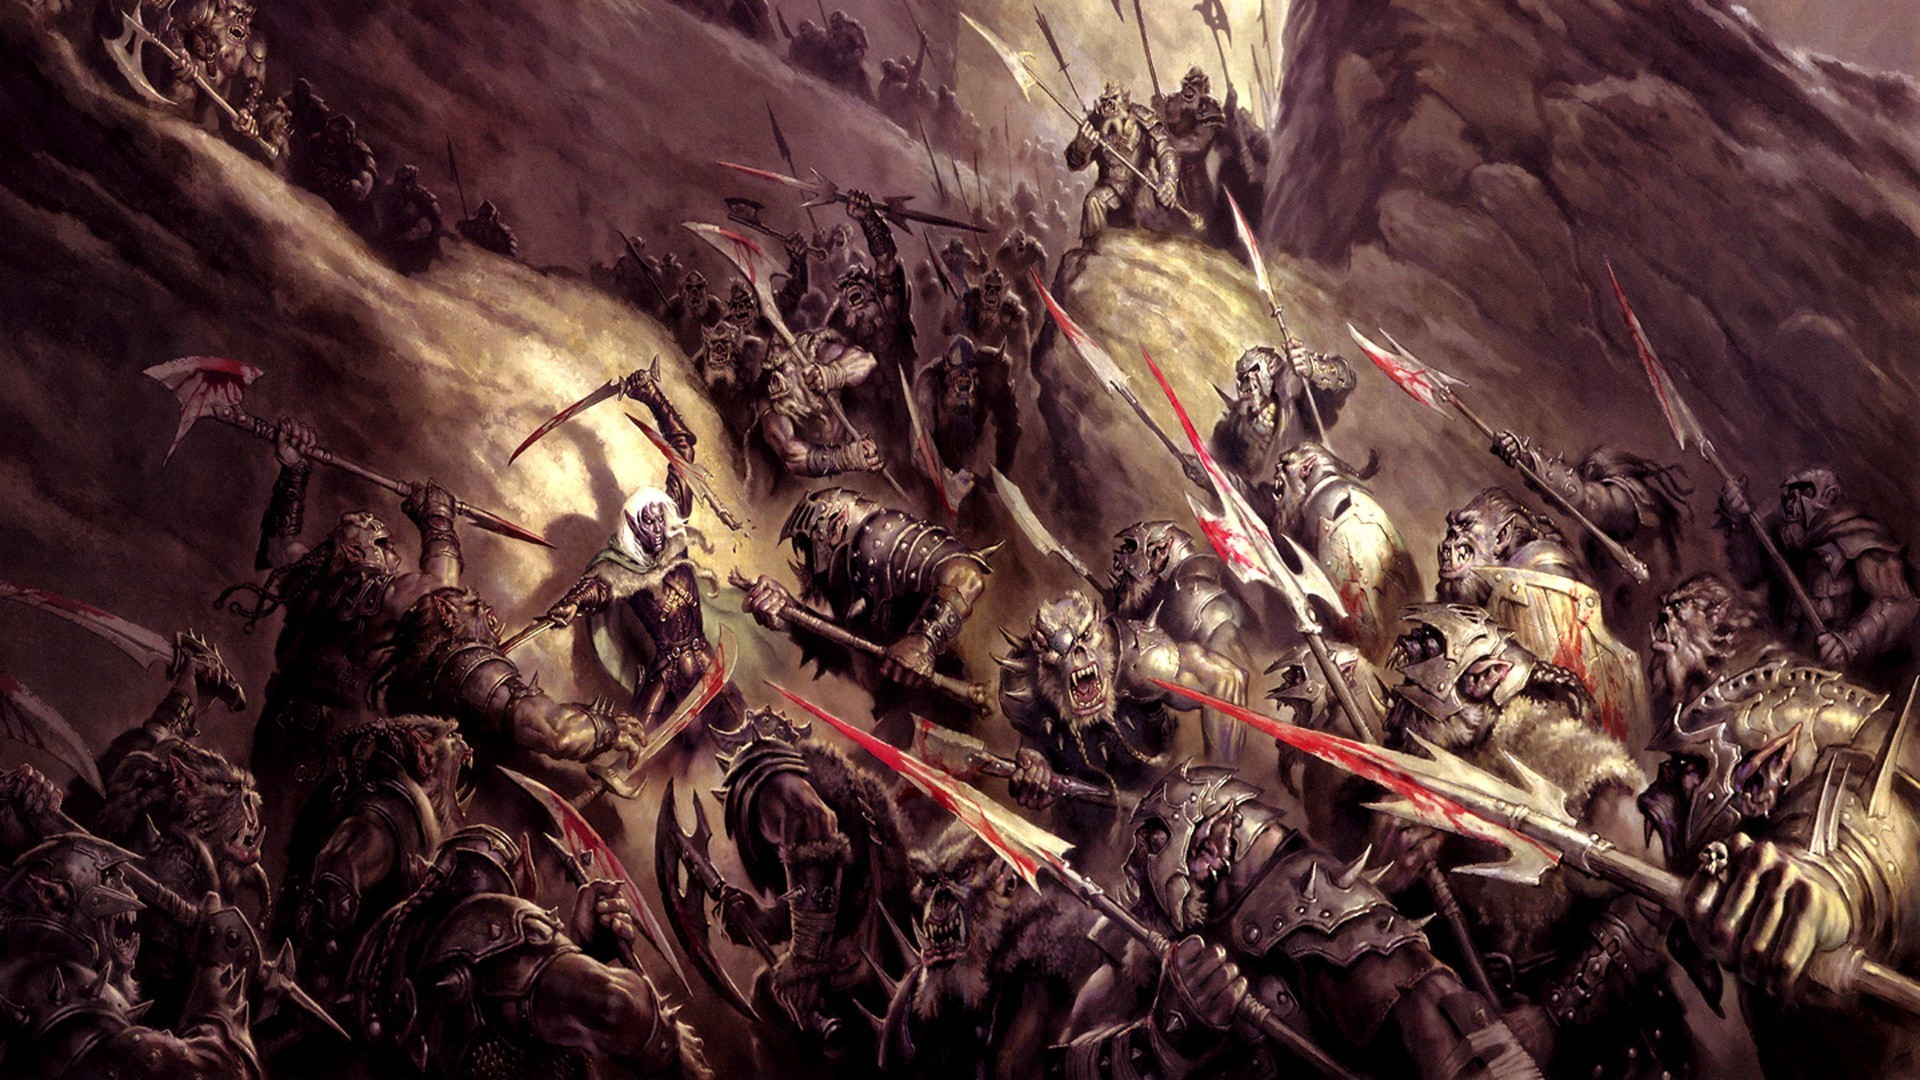 Orc battle HD Wallpaper 1920x1080 1920x1080